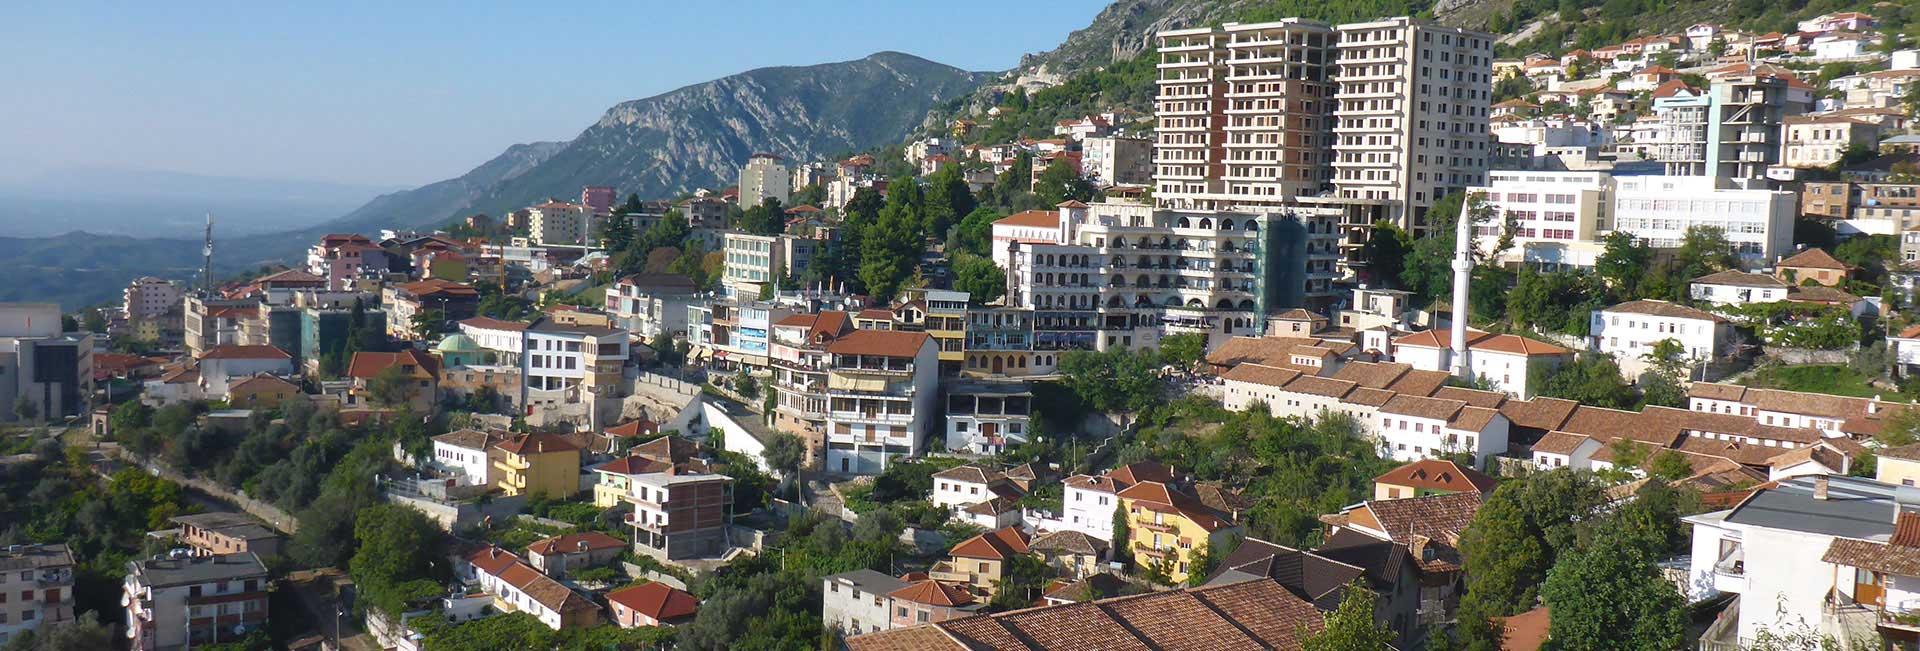 City view in Albania. Photo credit: Chris Lira